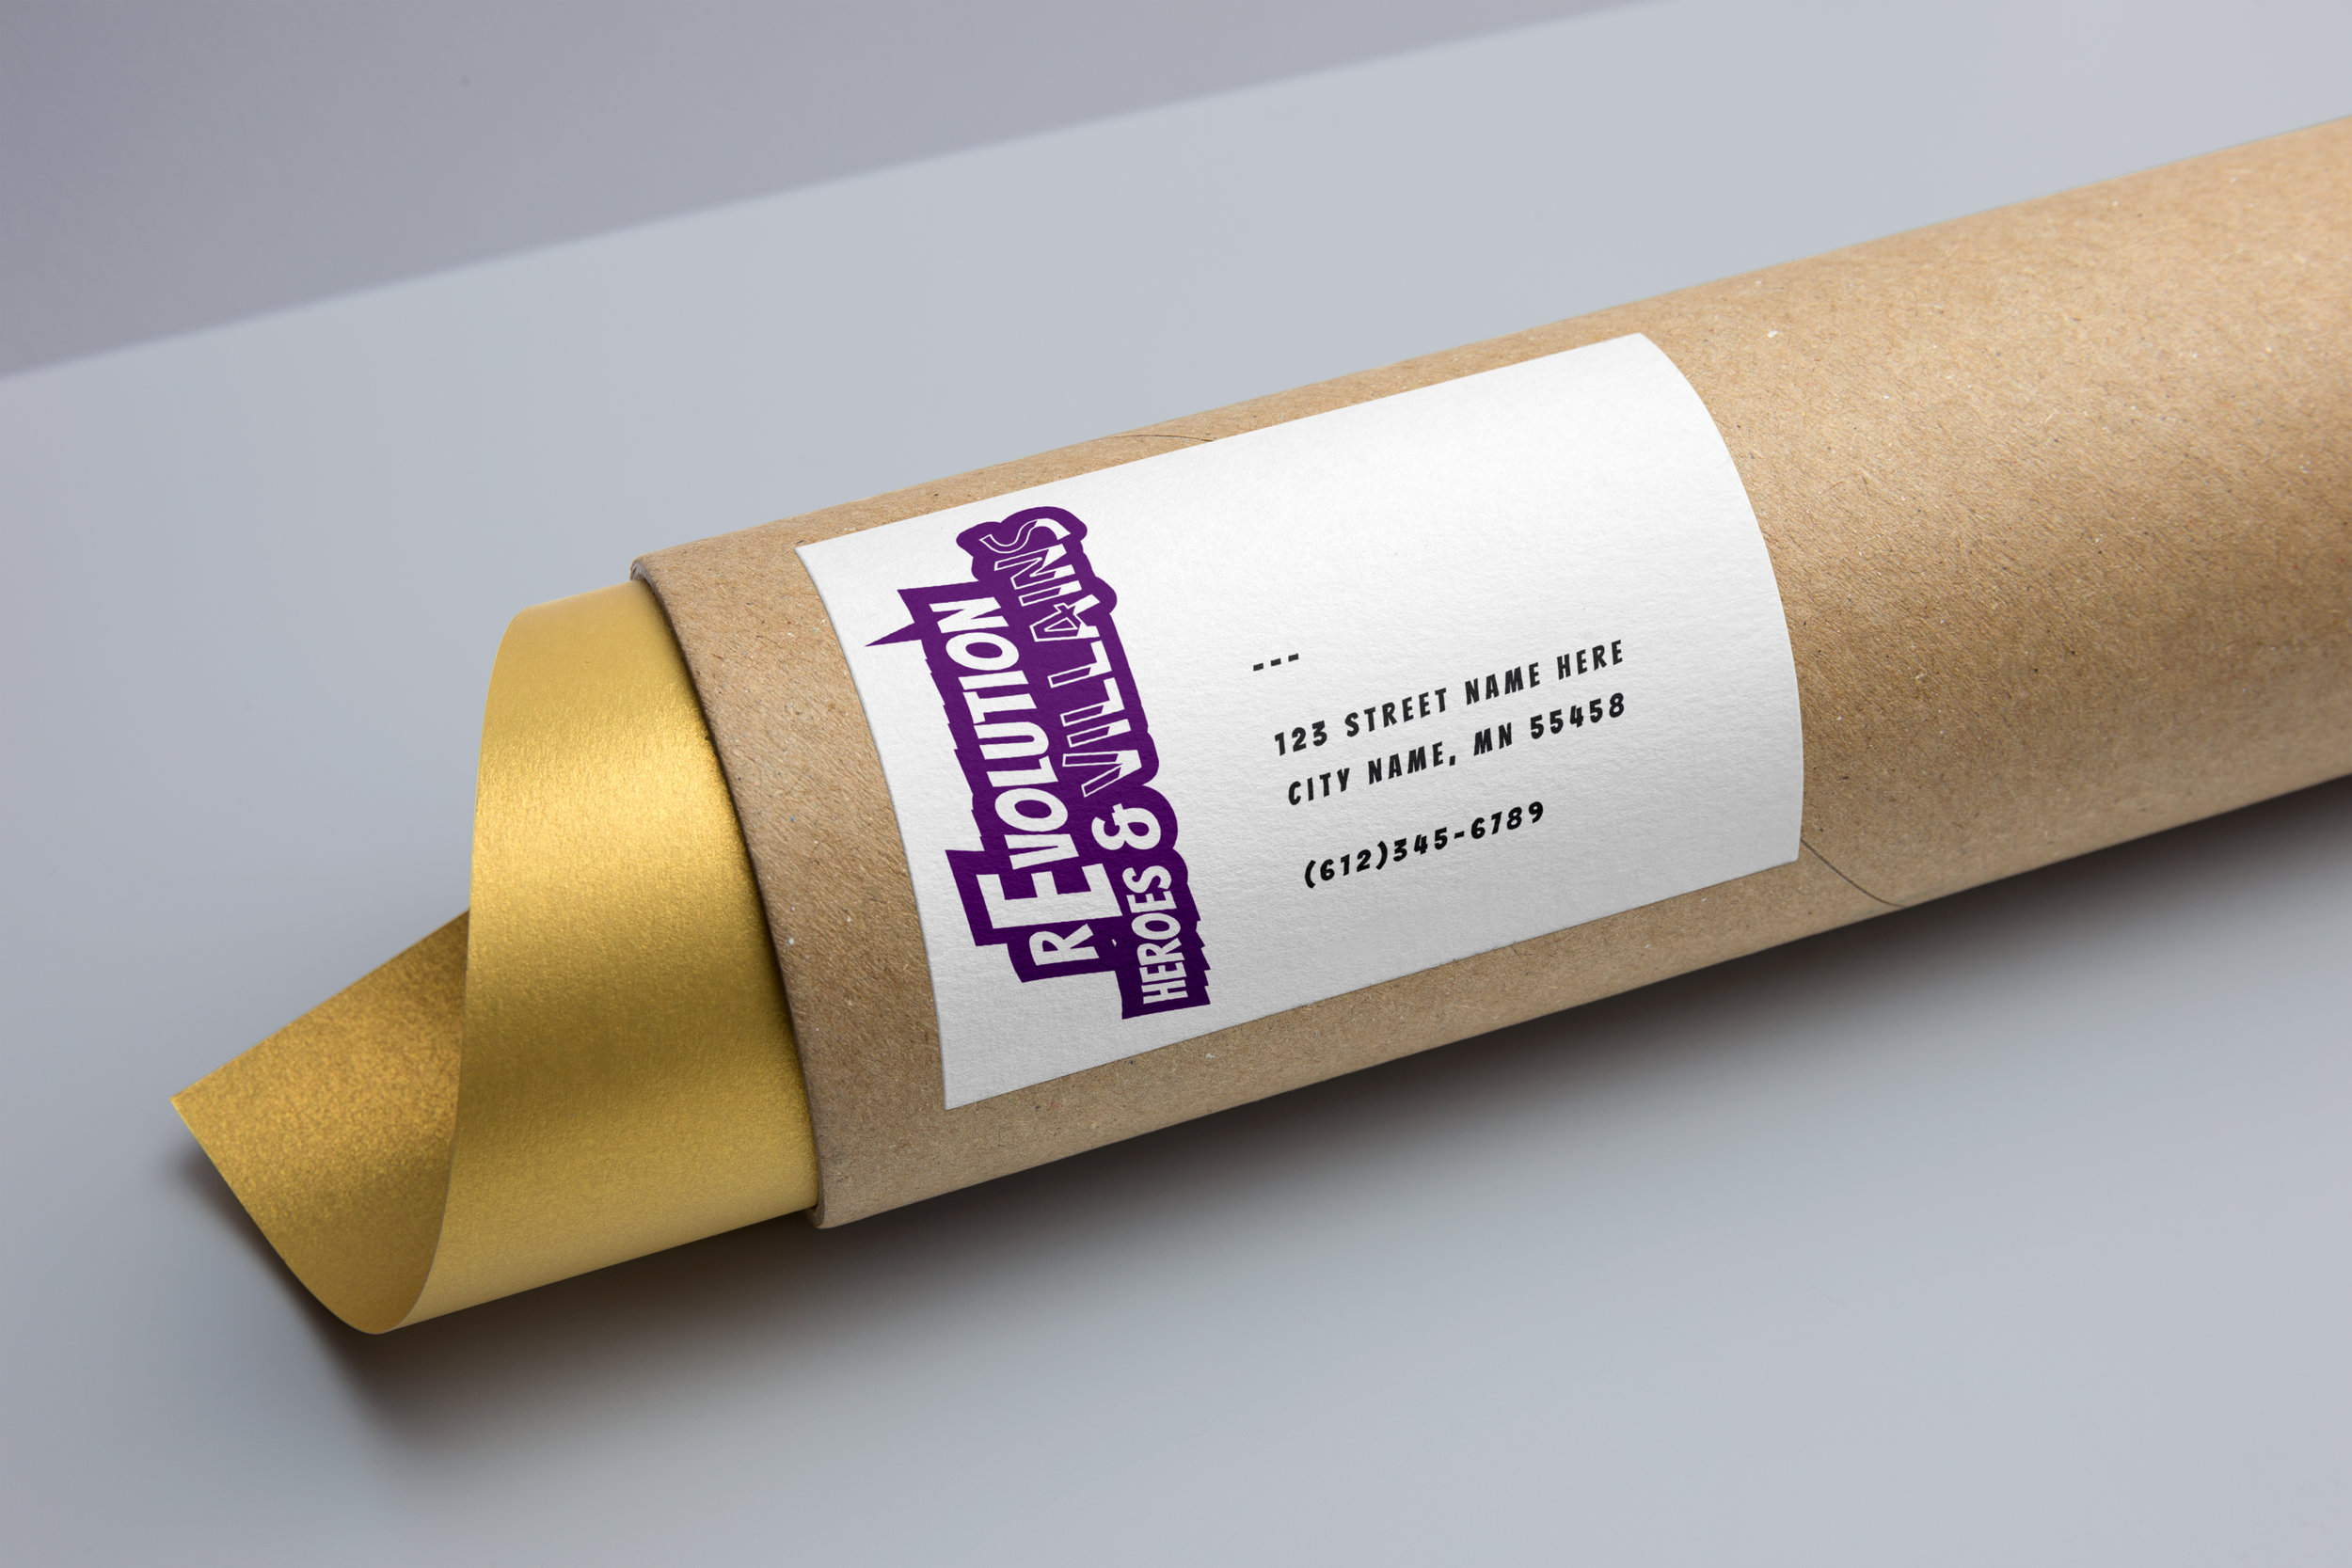 cardboard tube with revolution logo.jpg